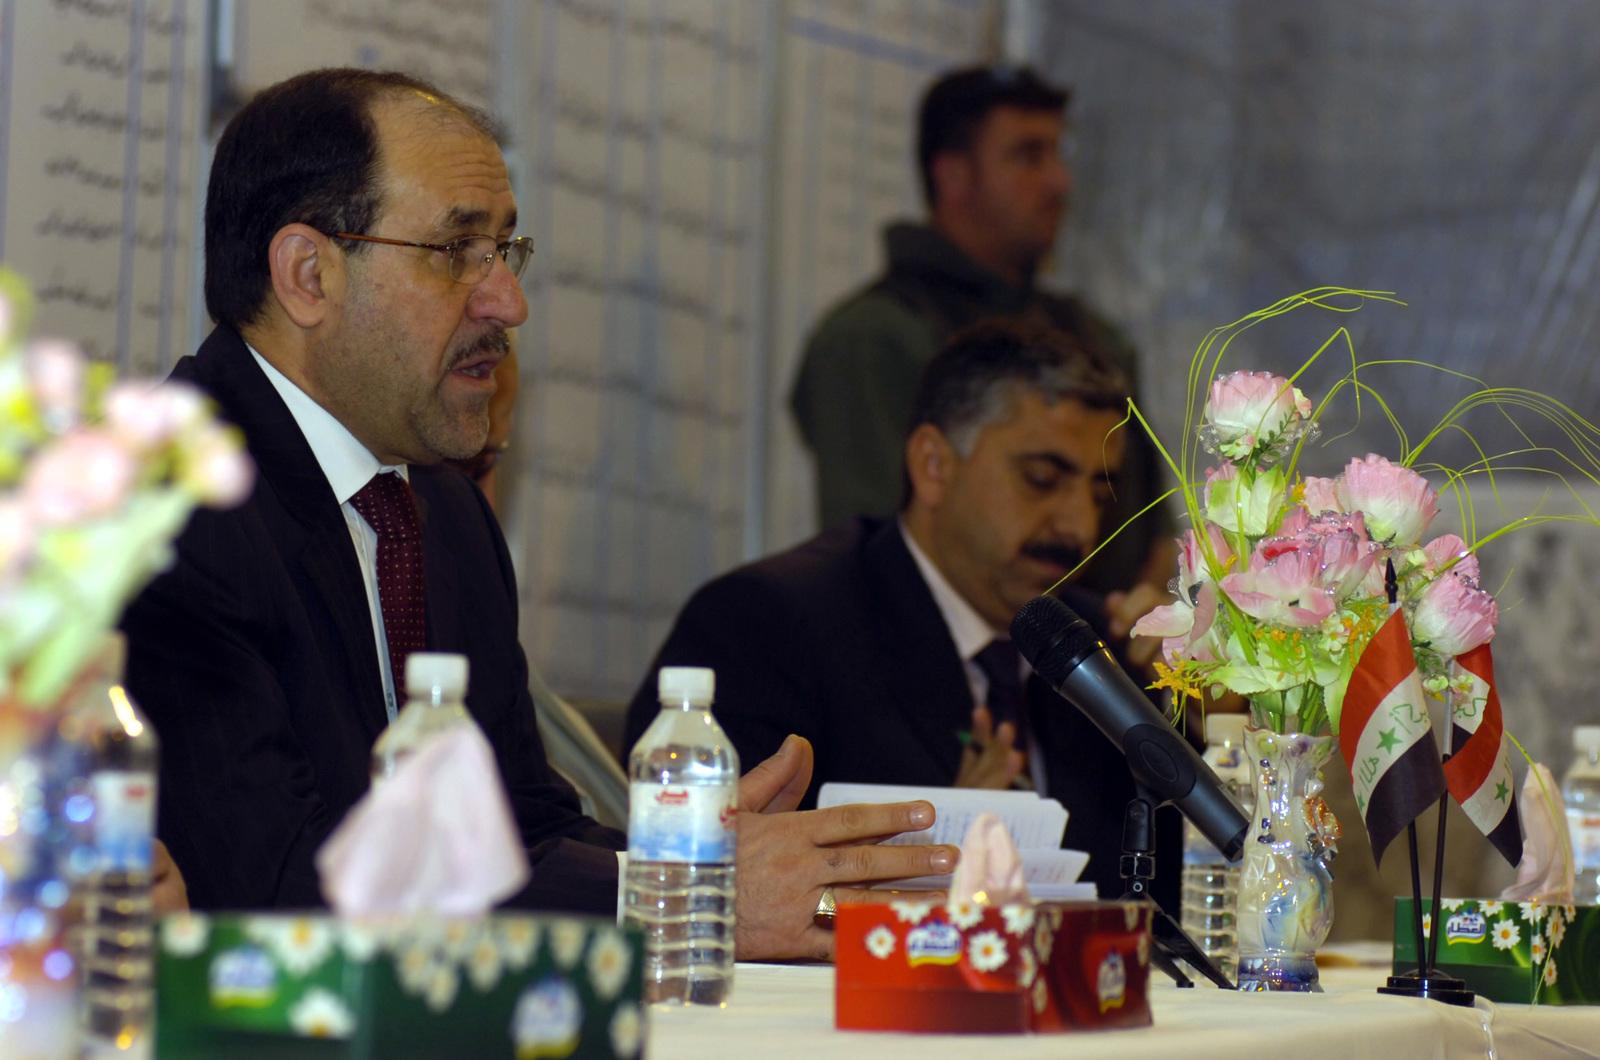 https nara getarchive net media prime minister nuri al maliki and members of his council speak to members of 6bb11c